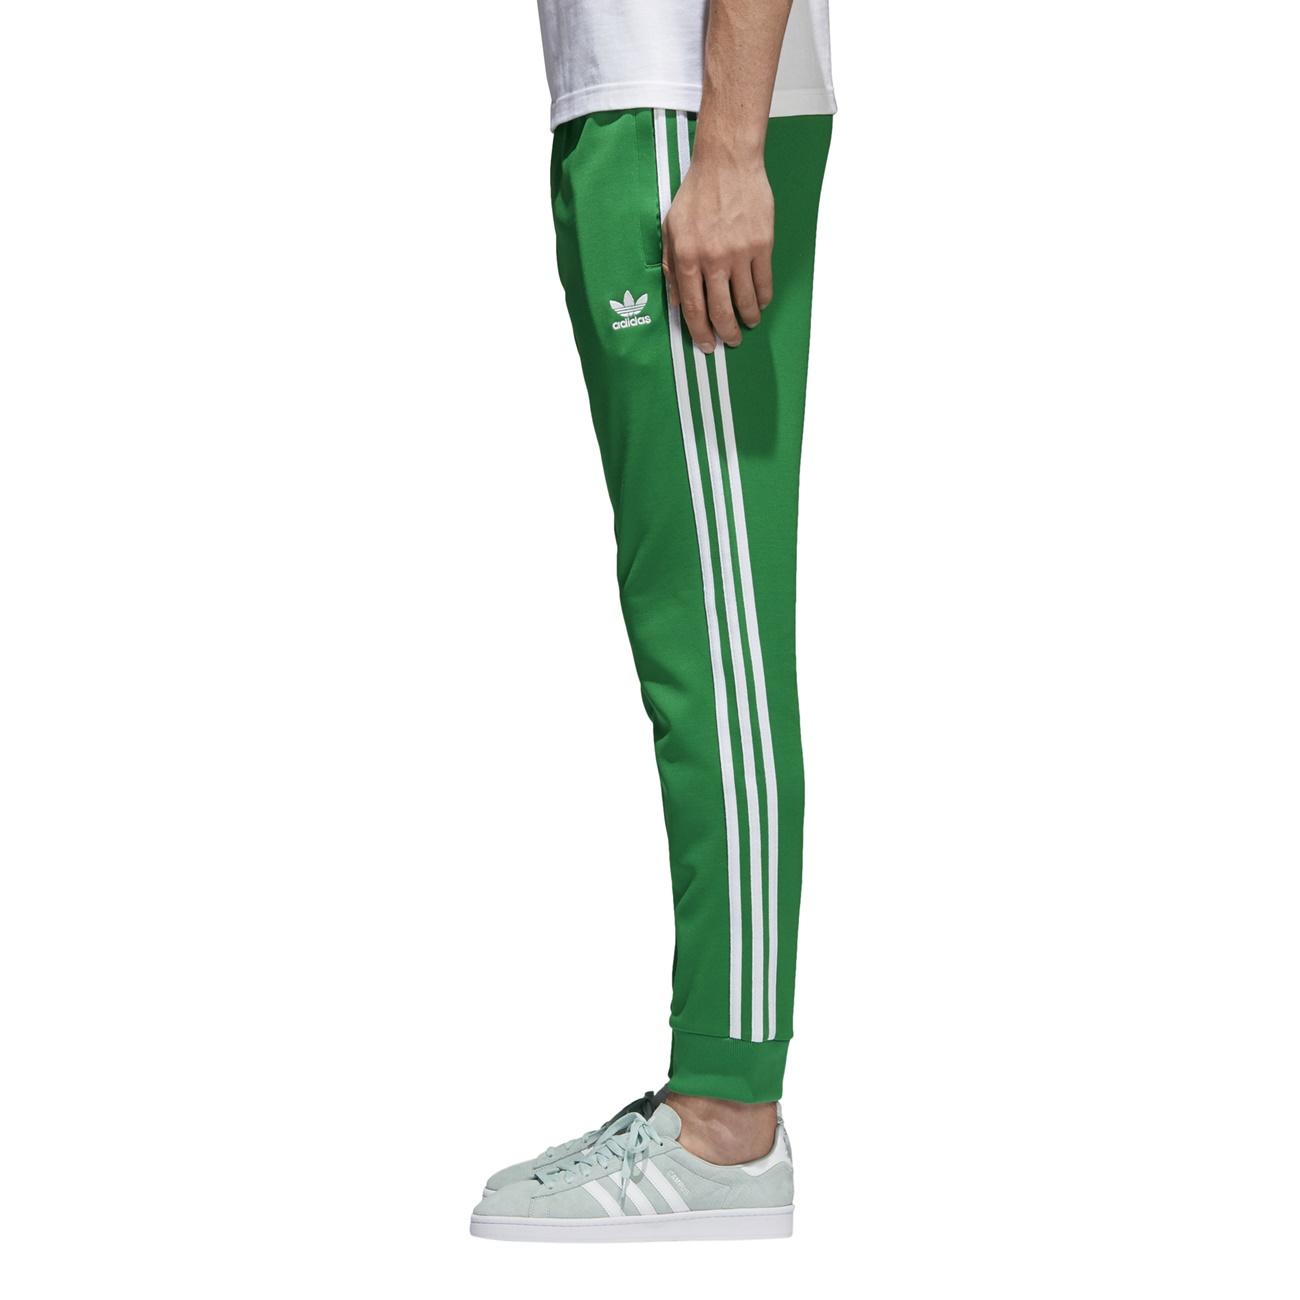 cheap for discount ebaec 48ca8 Adidas Originals Superstar Track Pants (Green)